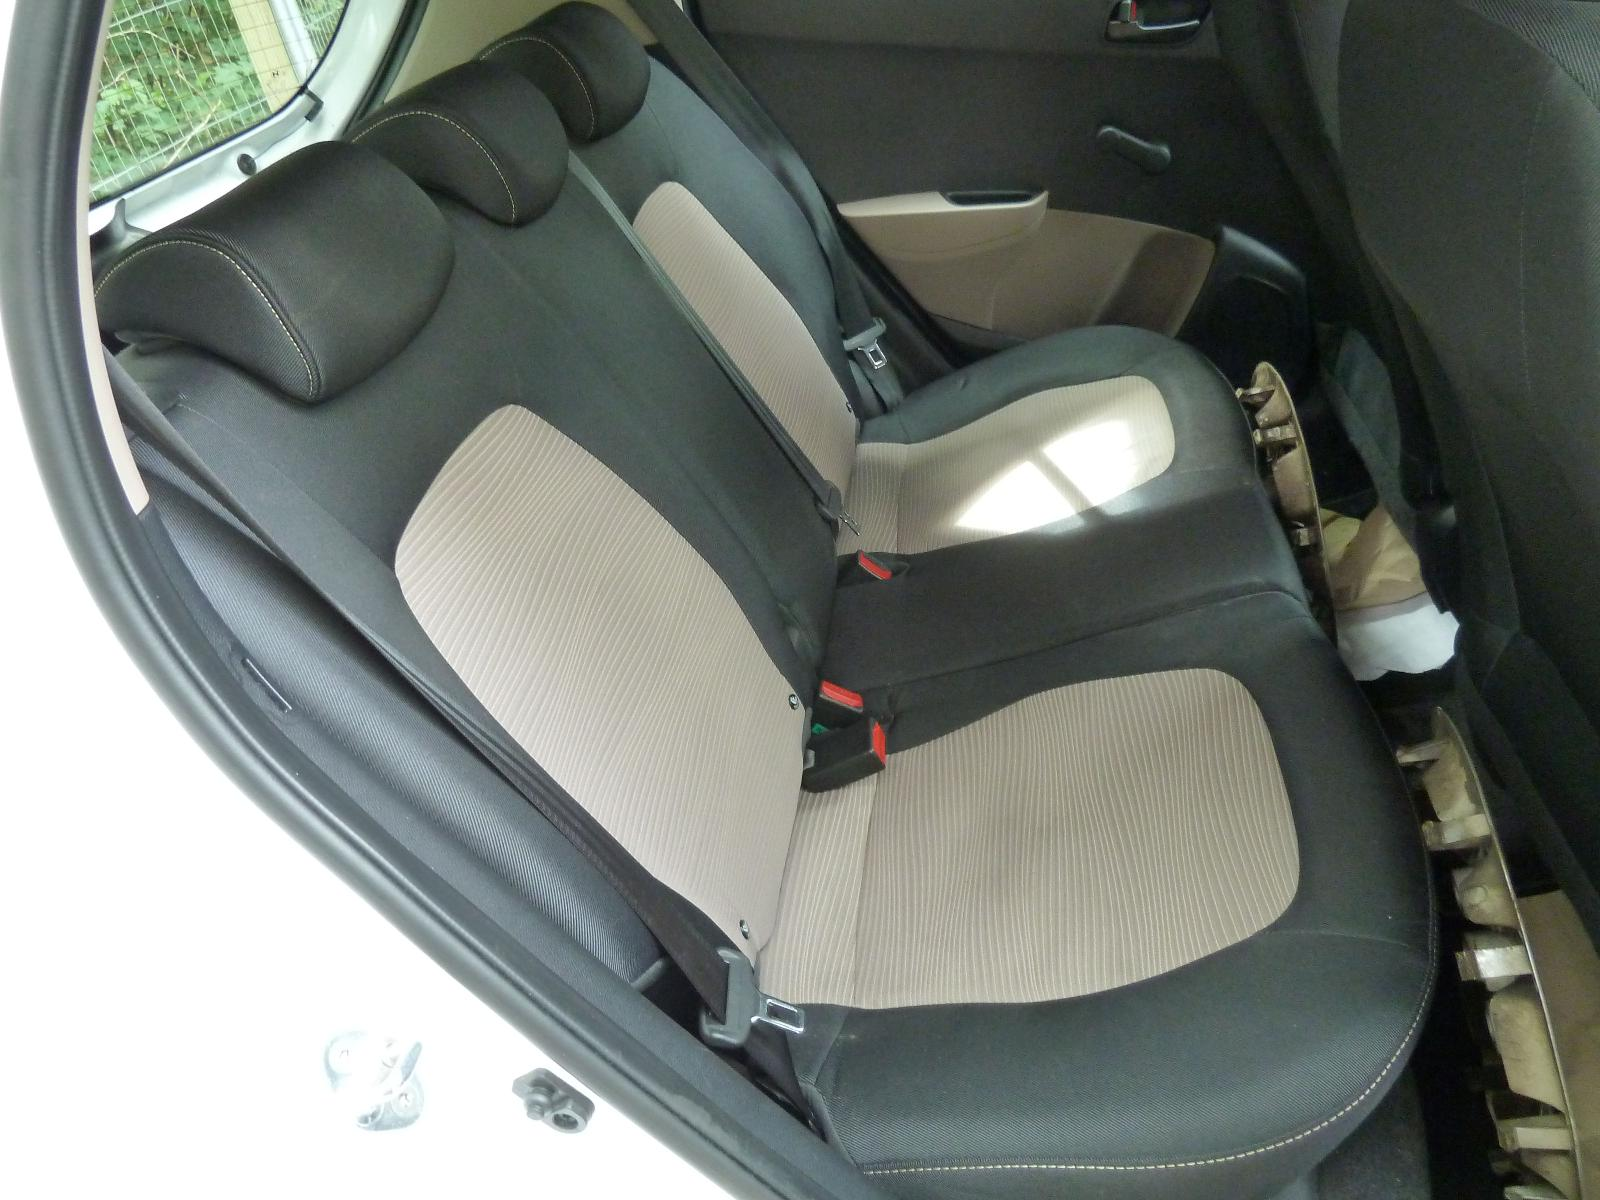 View Auto part 2nd Seat (Rear Seat) HYUNDAI I10 2016